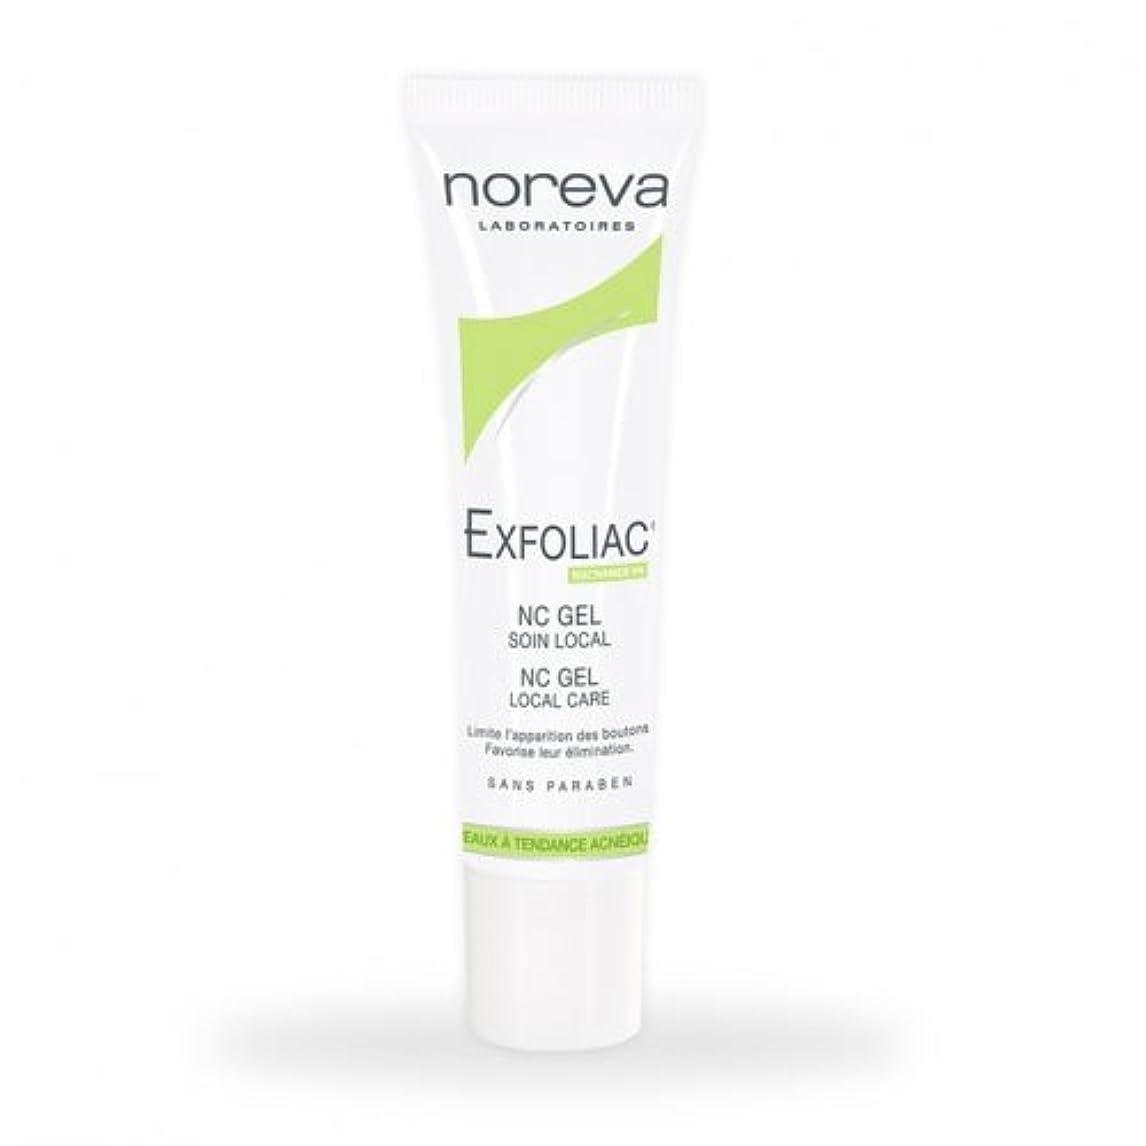 Noreva Exfoliac Nc Gel Local Care 30ml [並行輸入品]